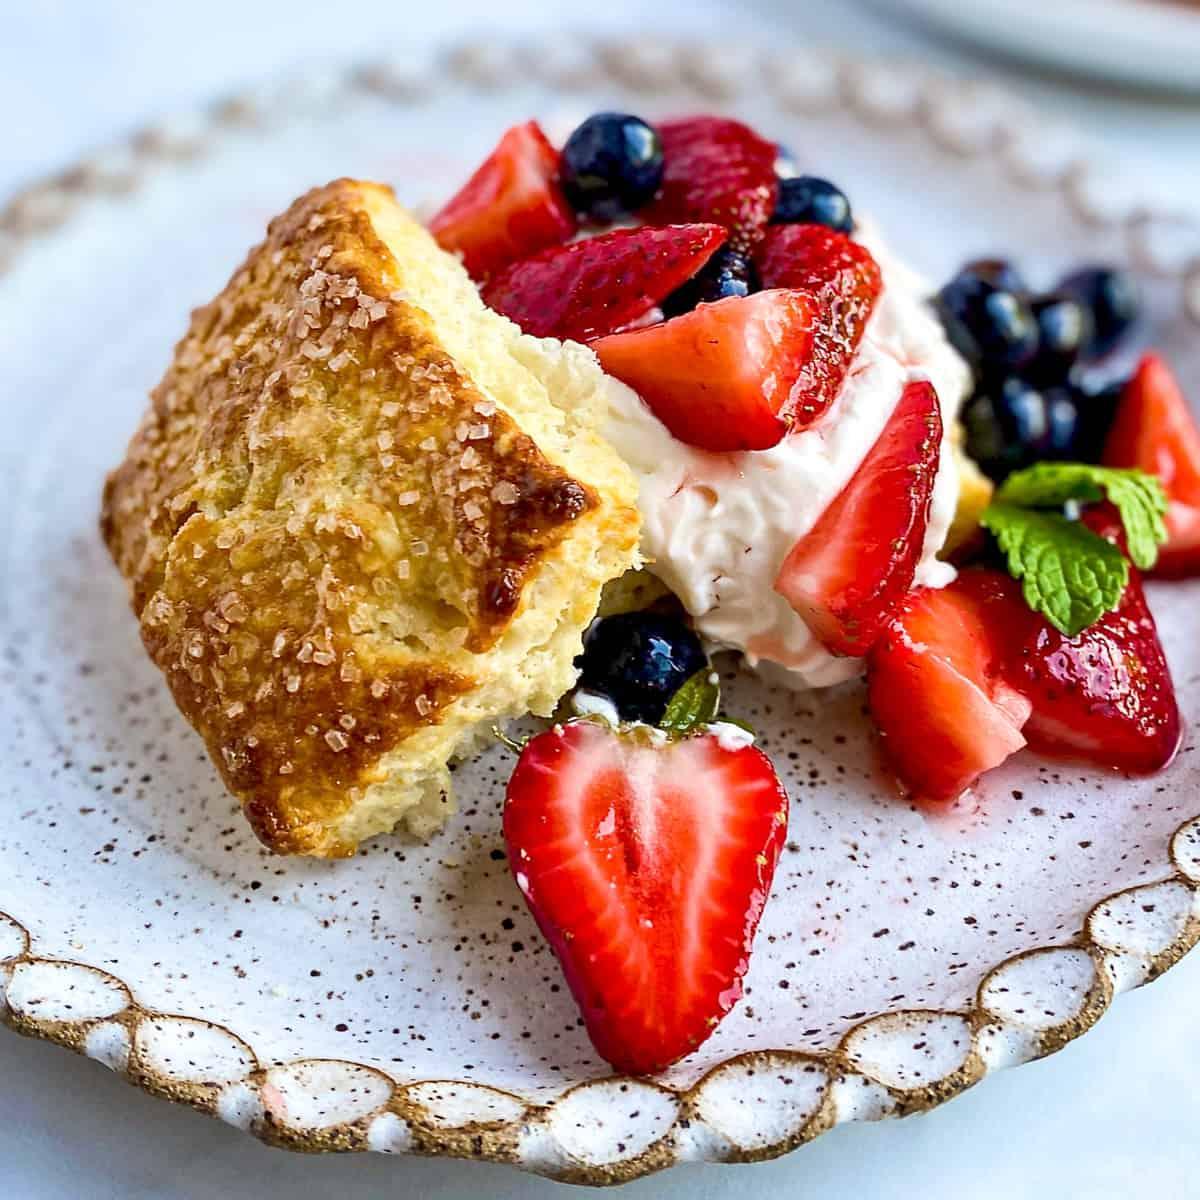 Breakfast Strawberry Shortcake with Whipped Greek Yogurt Cream